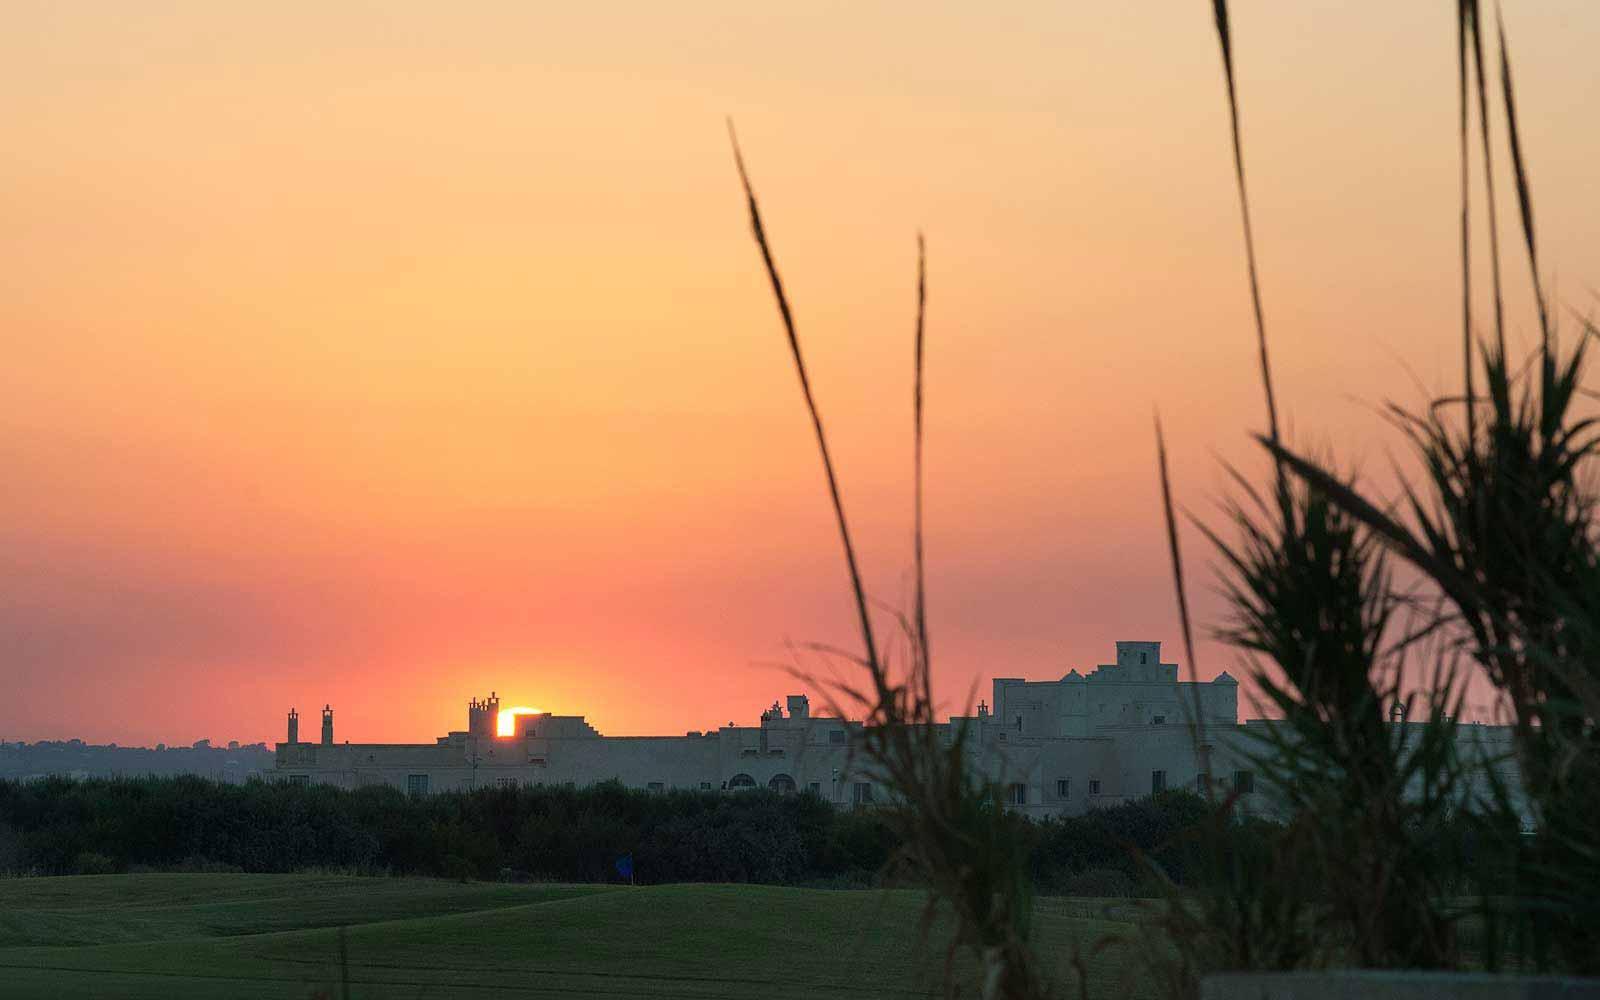 Panoramic sunset view of the Borgo Egnazia